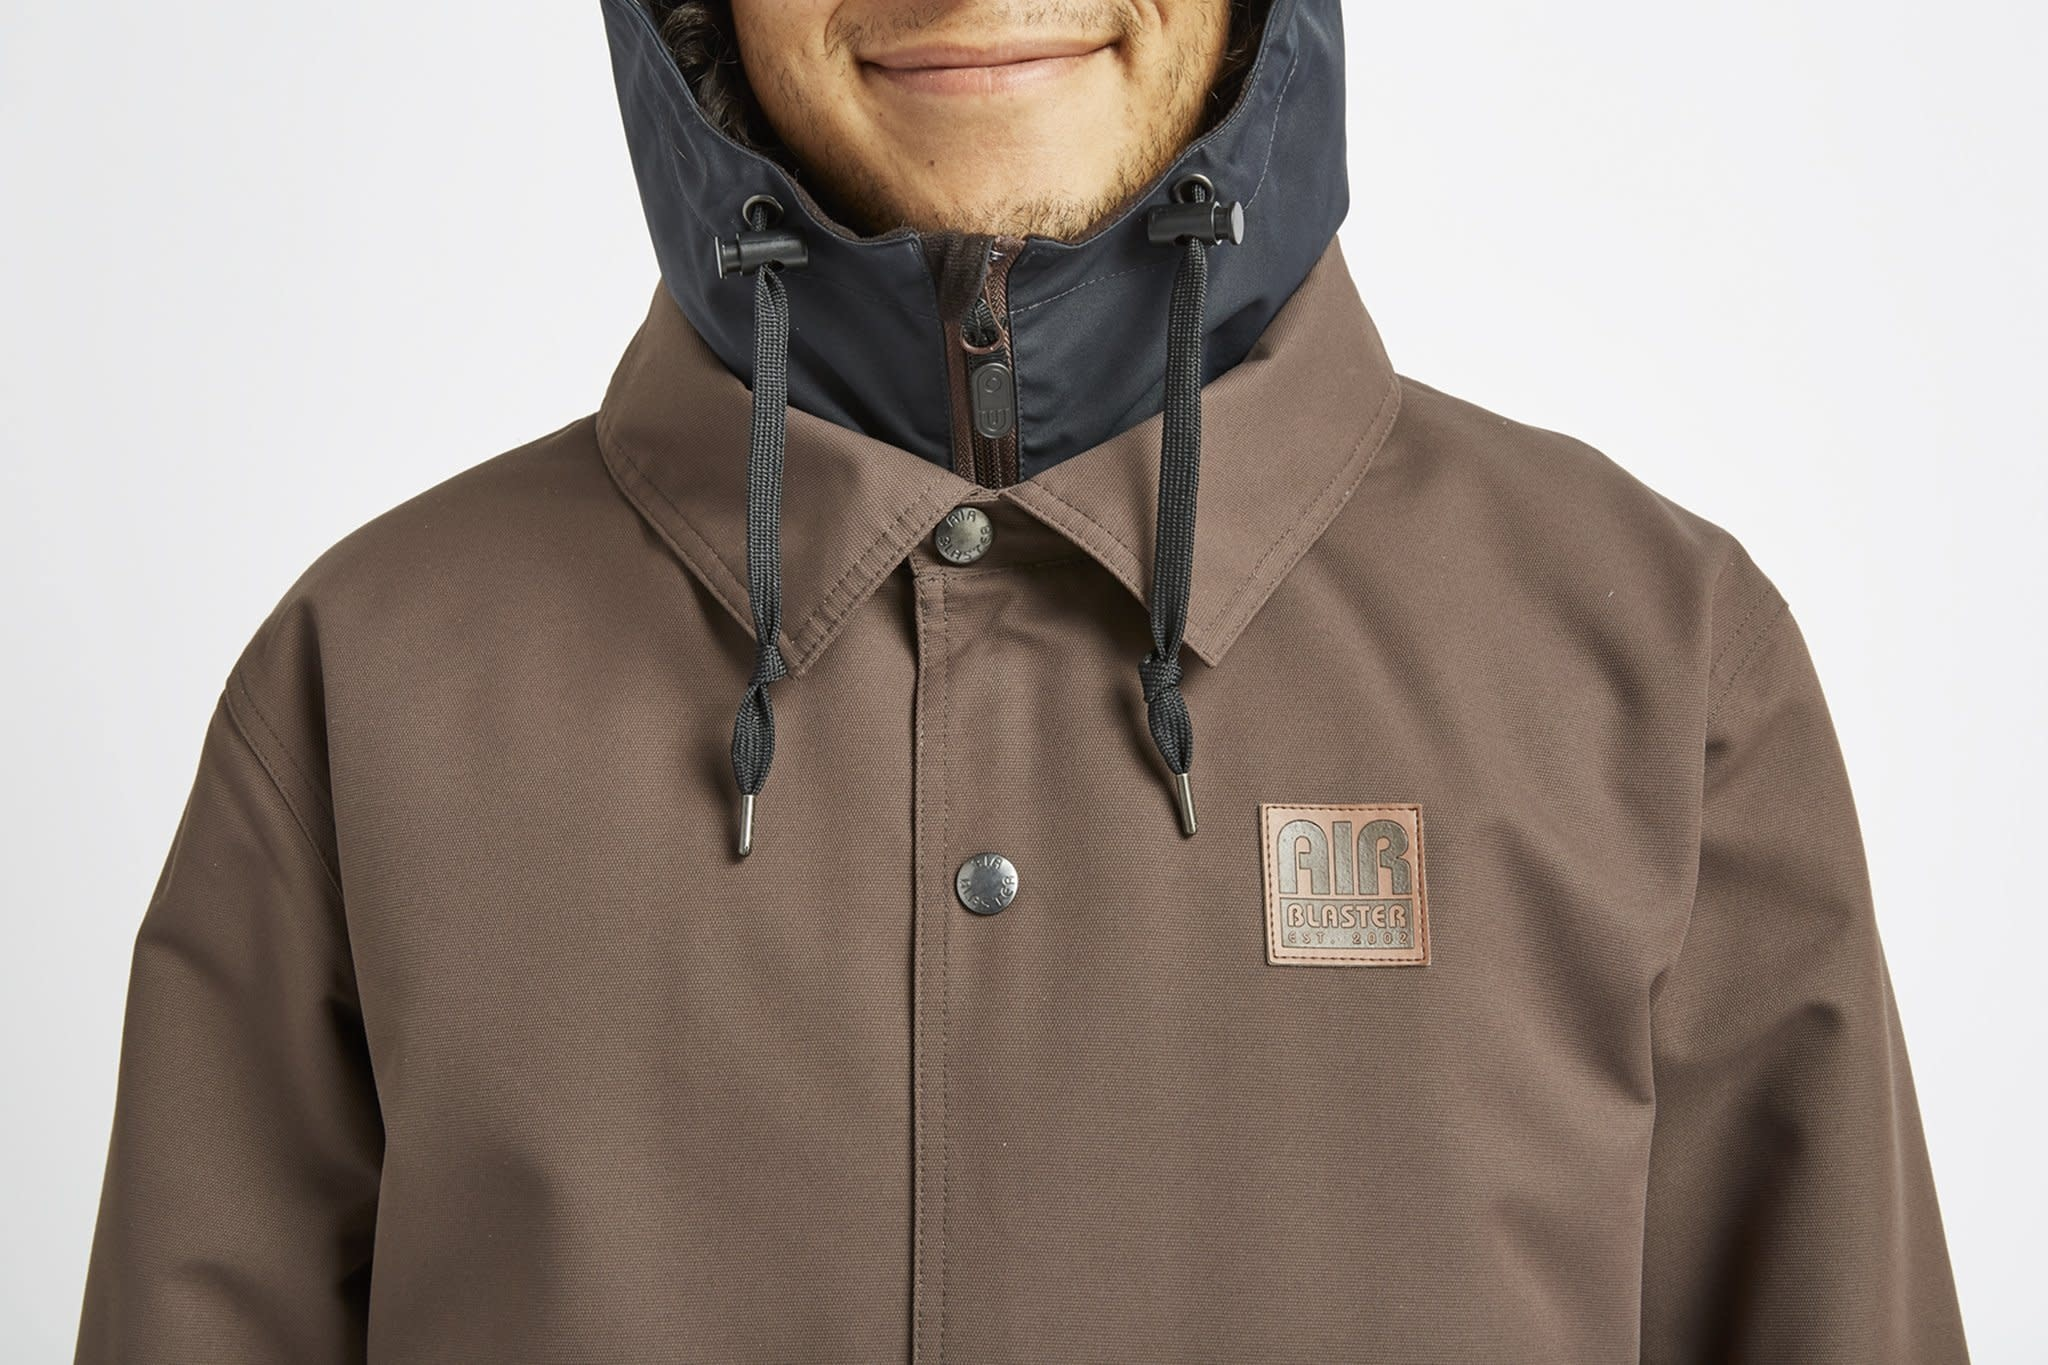 Airblaster Airblaster Men's Work Jacket